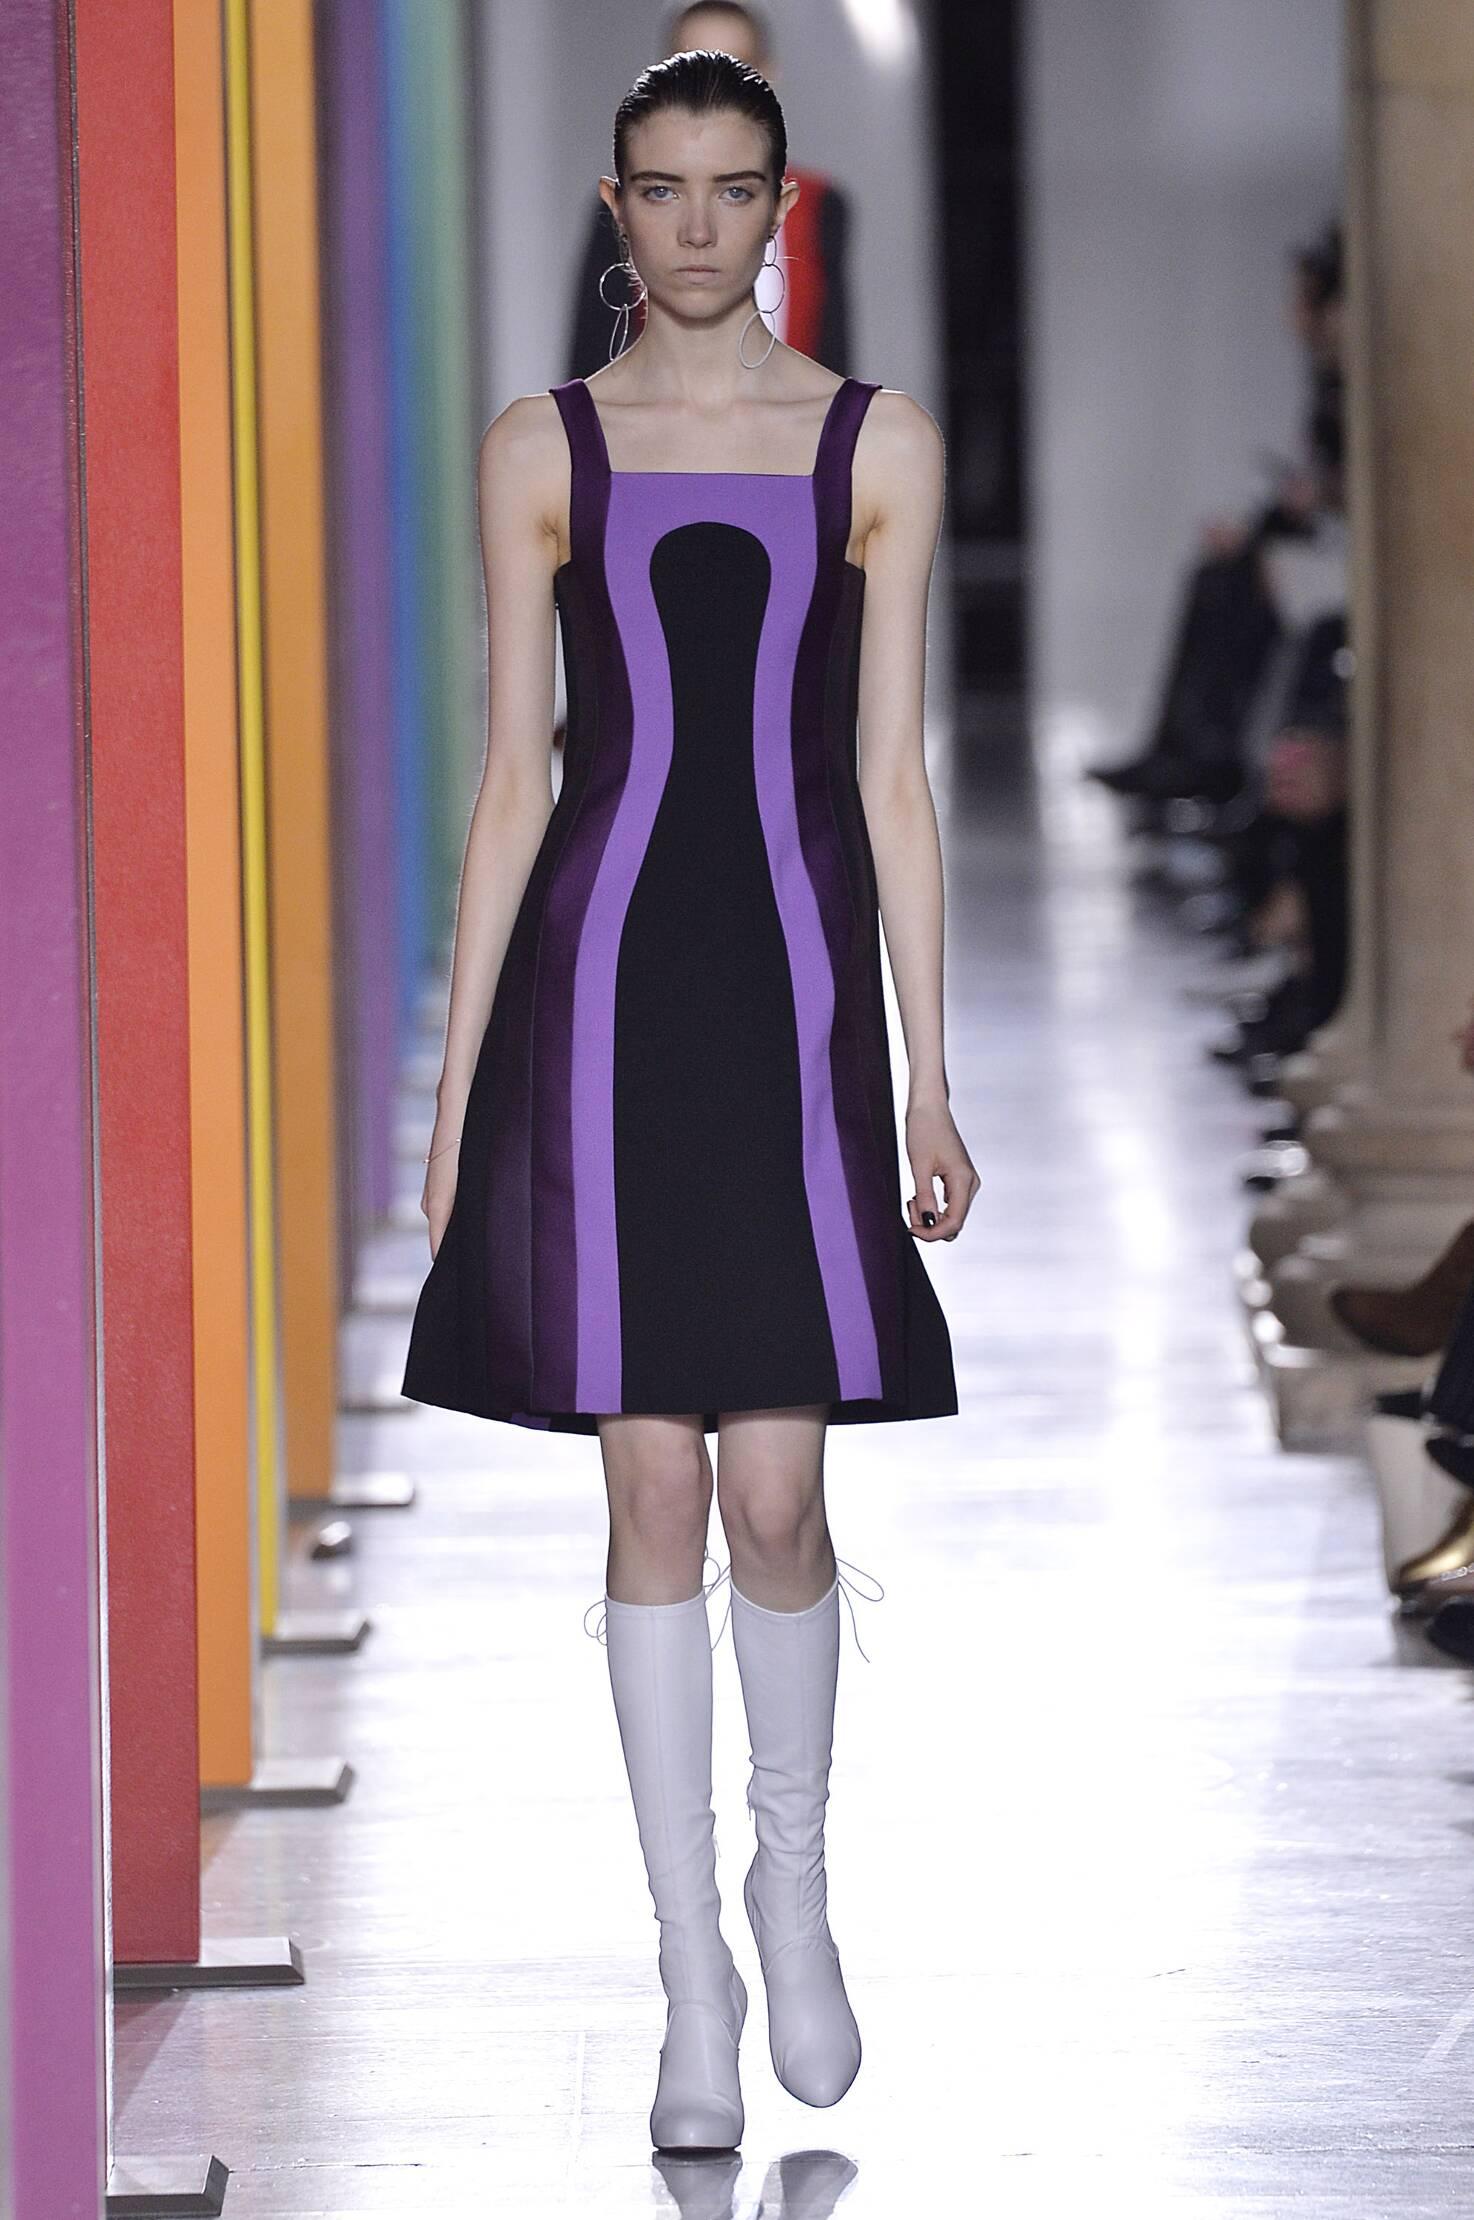 Fashion Trends Jonathan Saunders